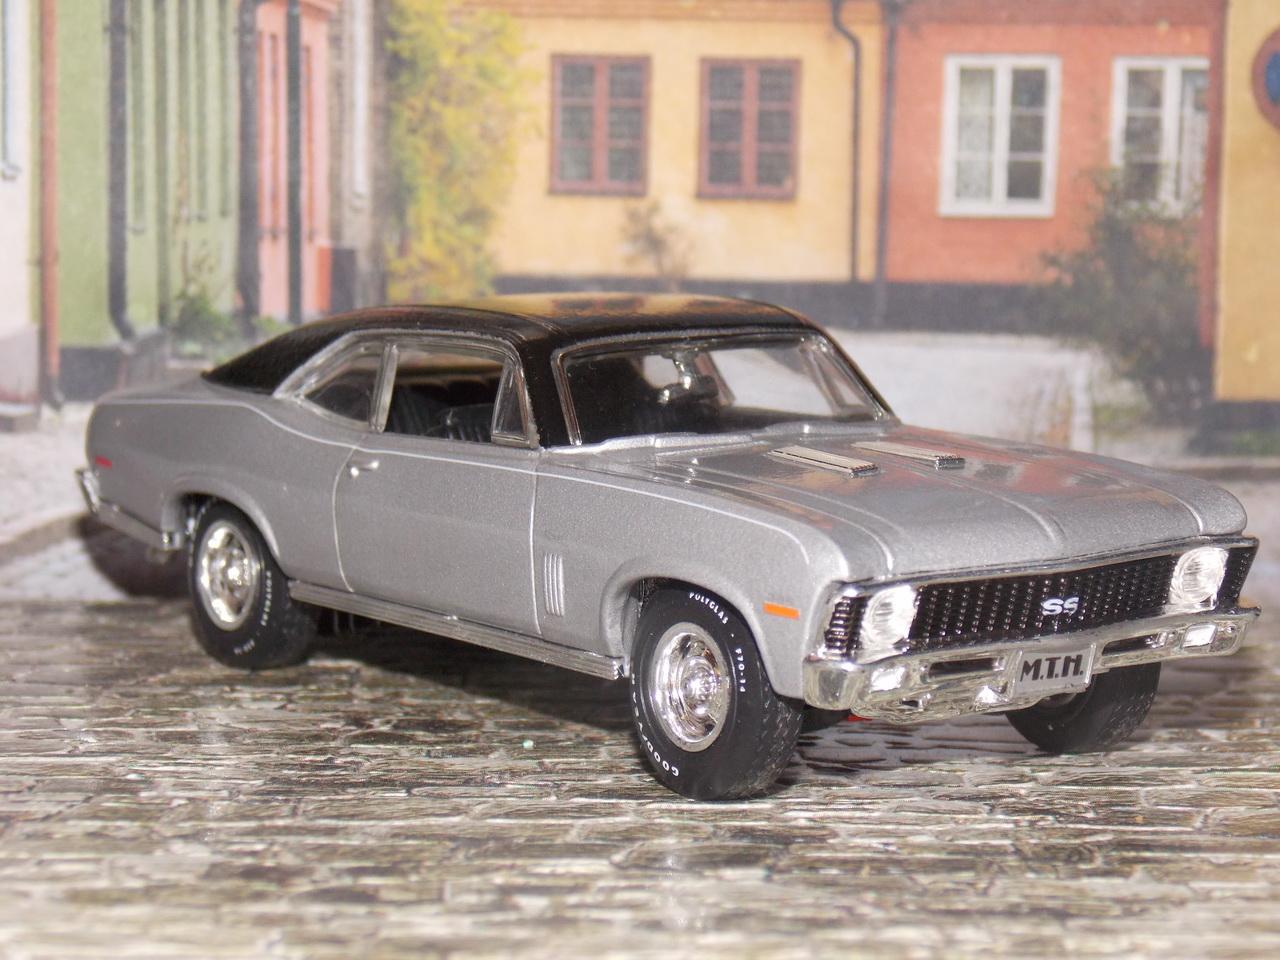 Chevrolet Nova SS 350 – 1968